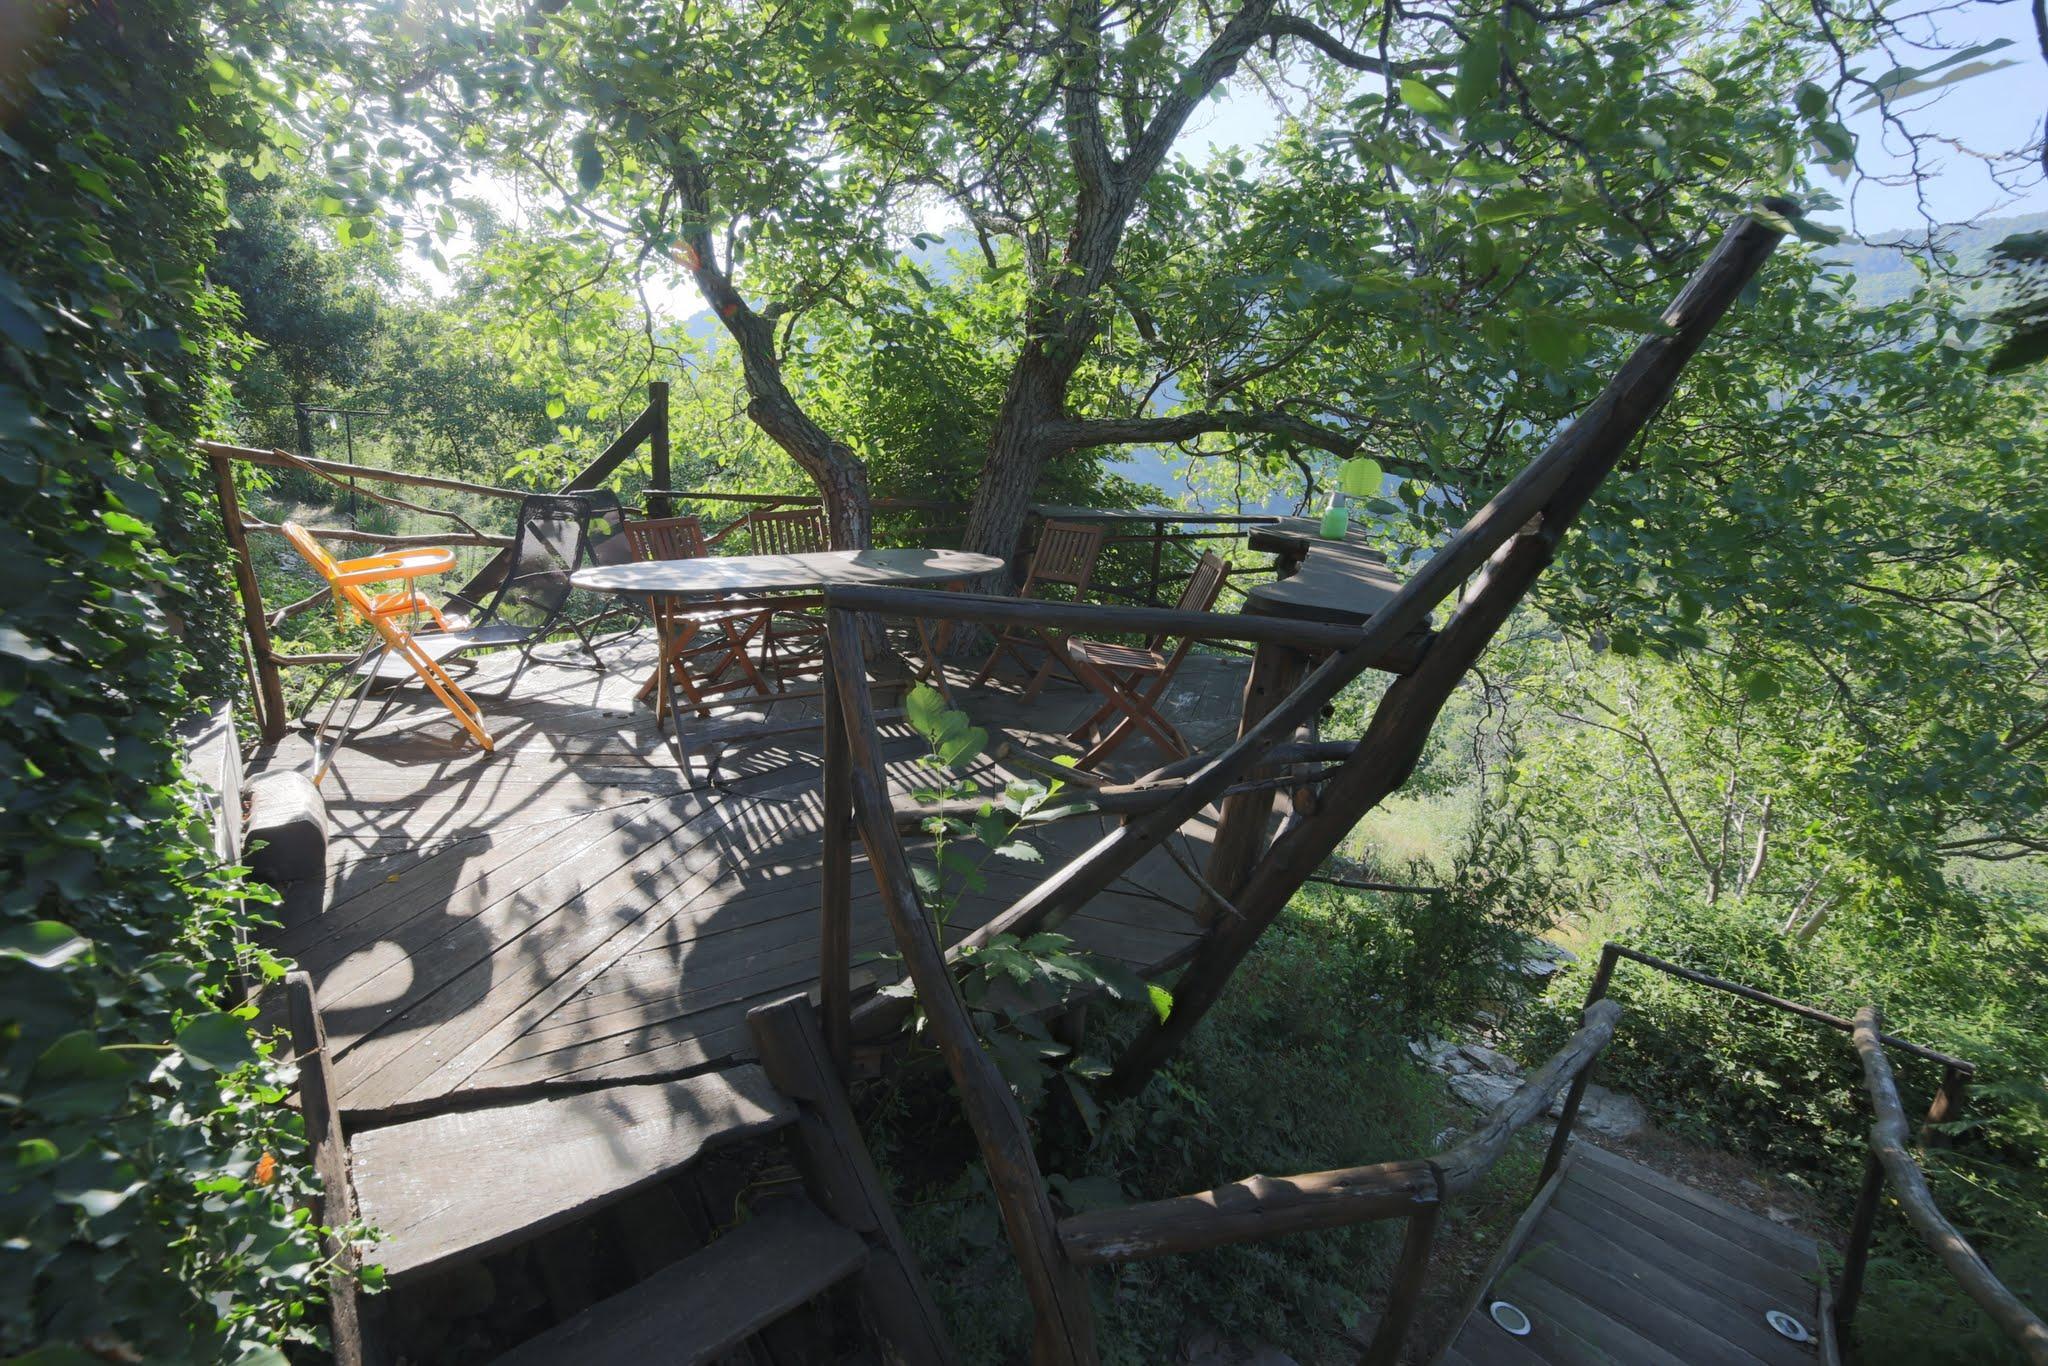 La terrasse de la cuisine clède